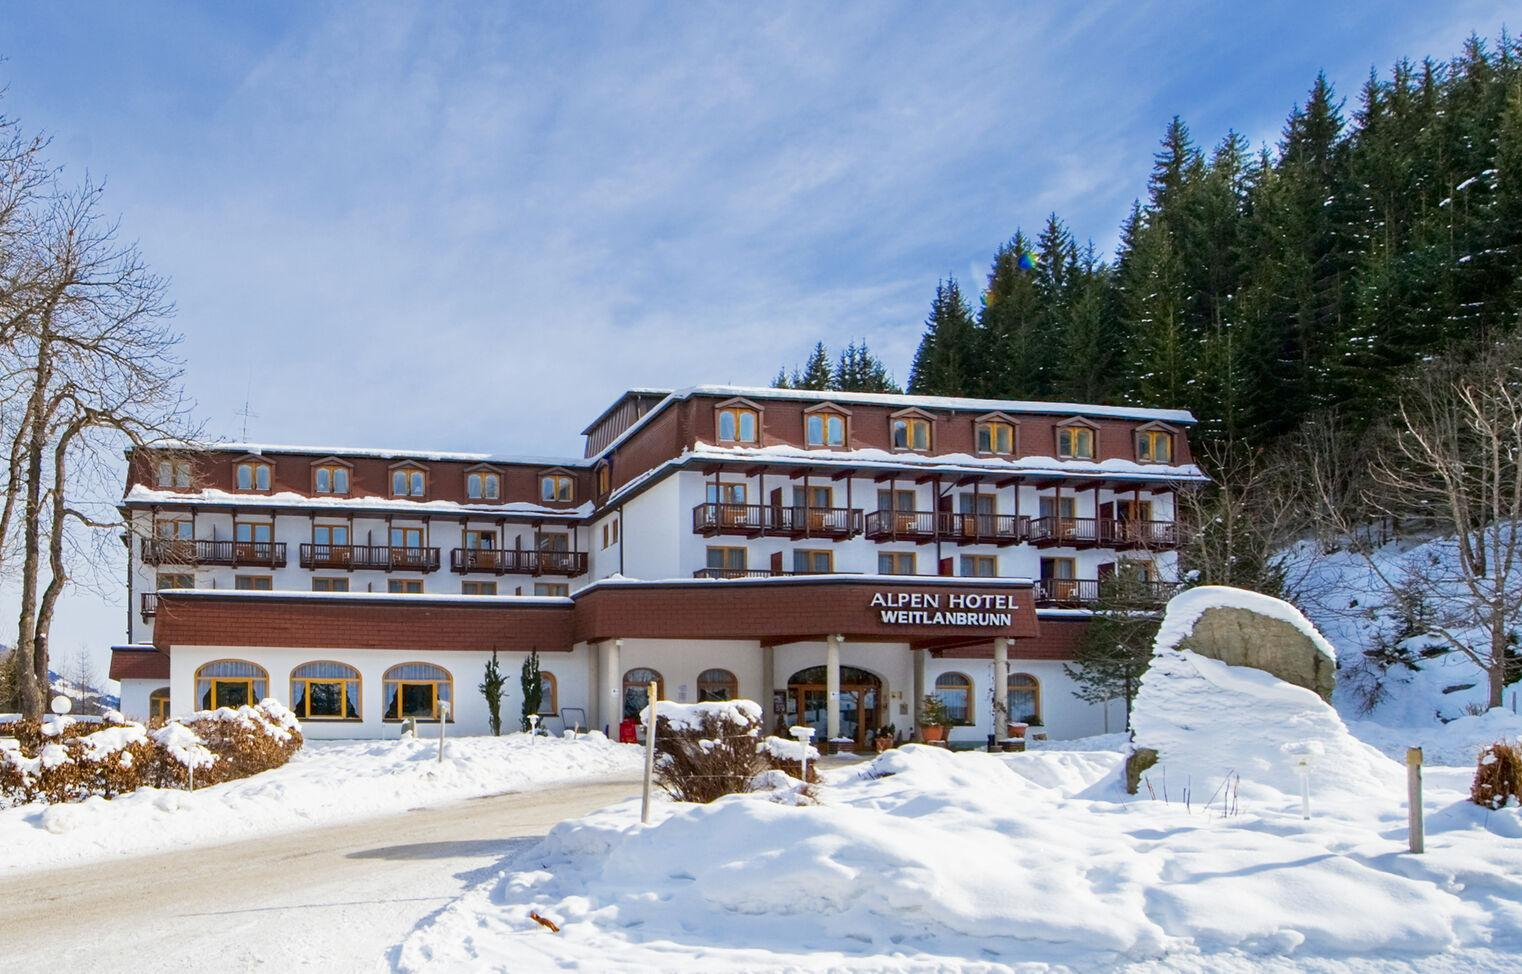 Alpenhotel Weitlanbrunn Tirol